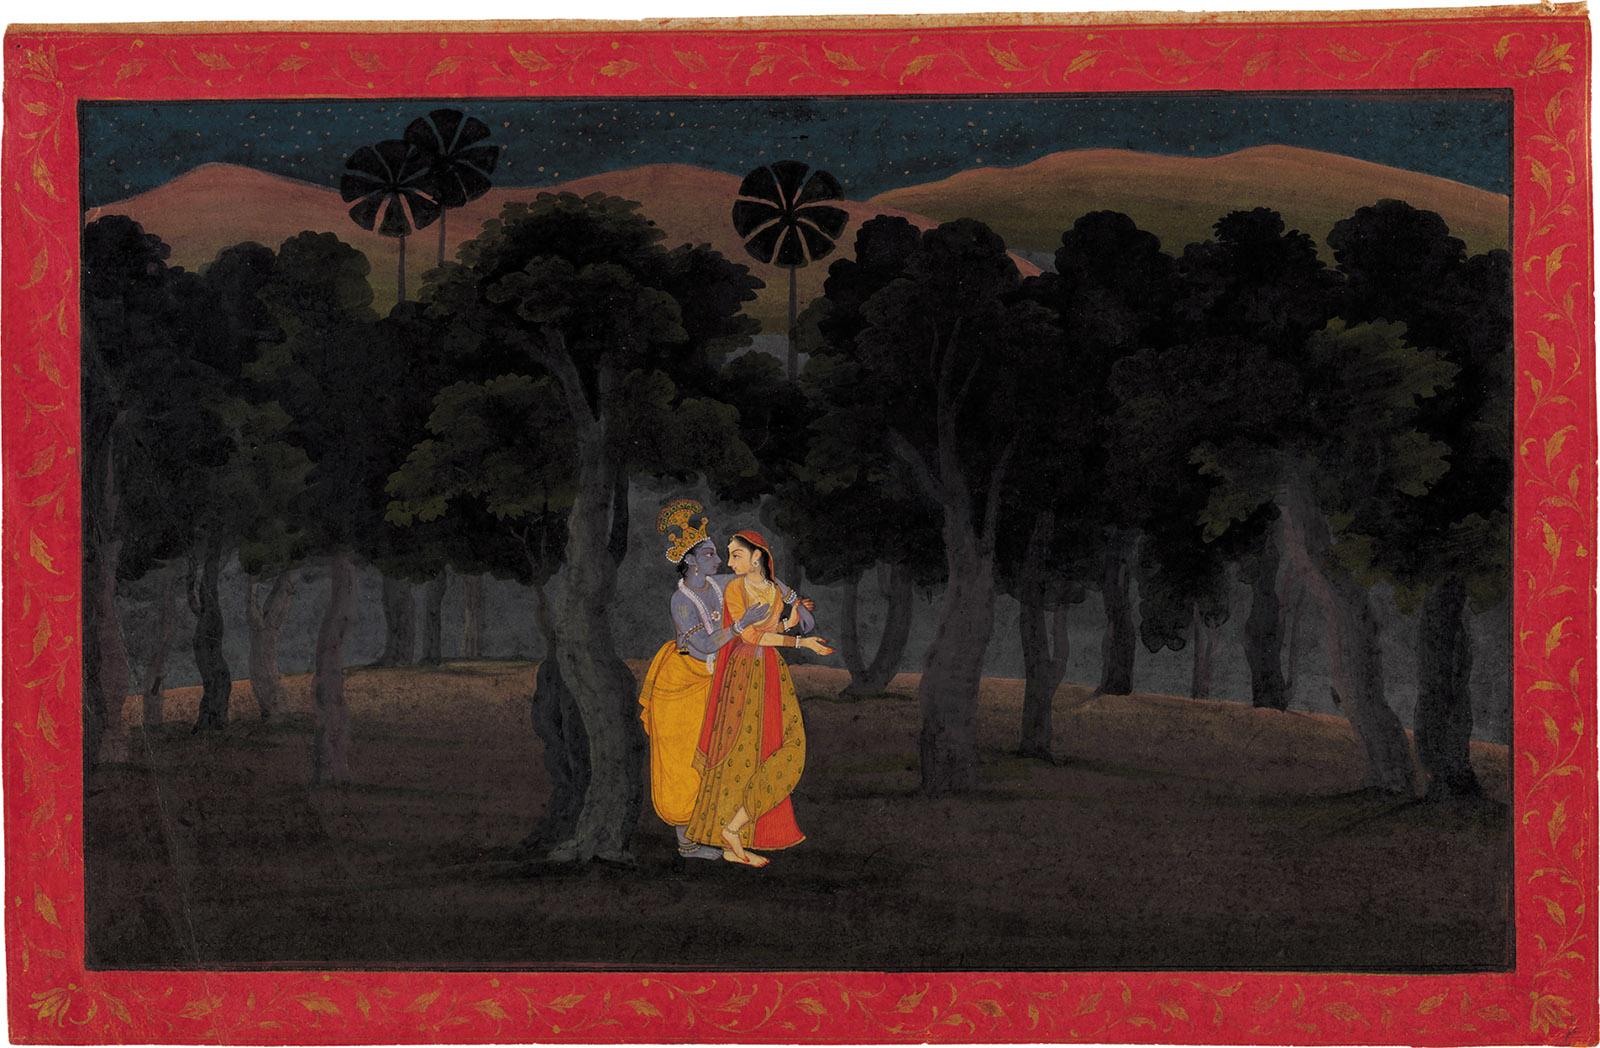 'The Lovers Radha and Krishna in a Palm Grove'; miniature painting from the 'Tehri Garhwal' Gita Govinda (Song of the Cowherds), Punjab Hills, kingdom of Kangra or Guler, circa 1775–1780